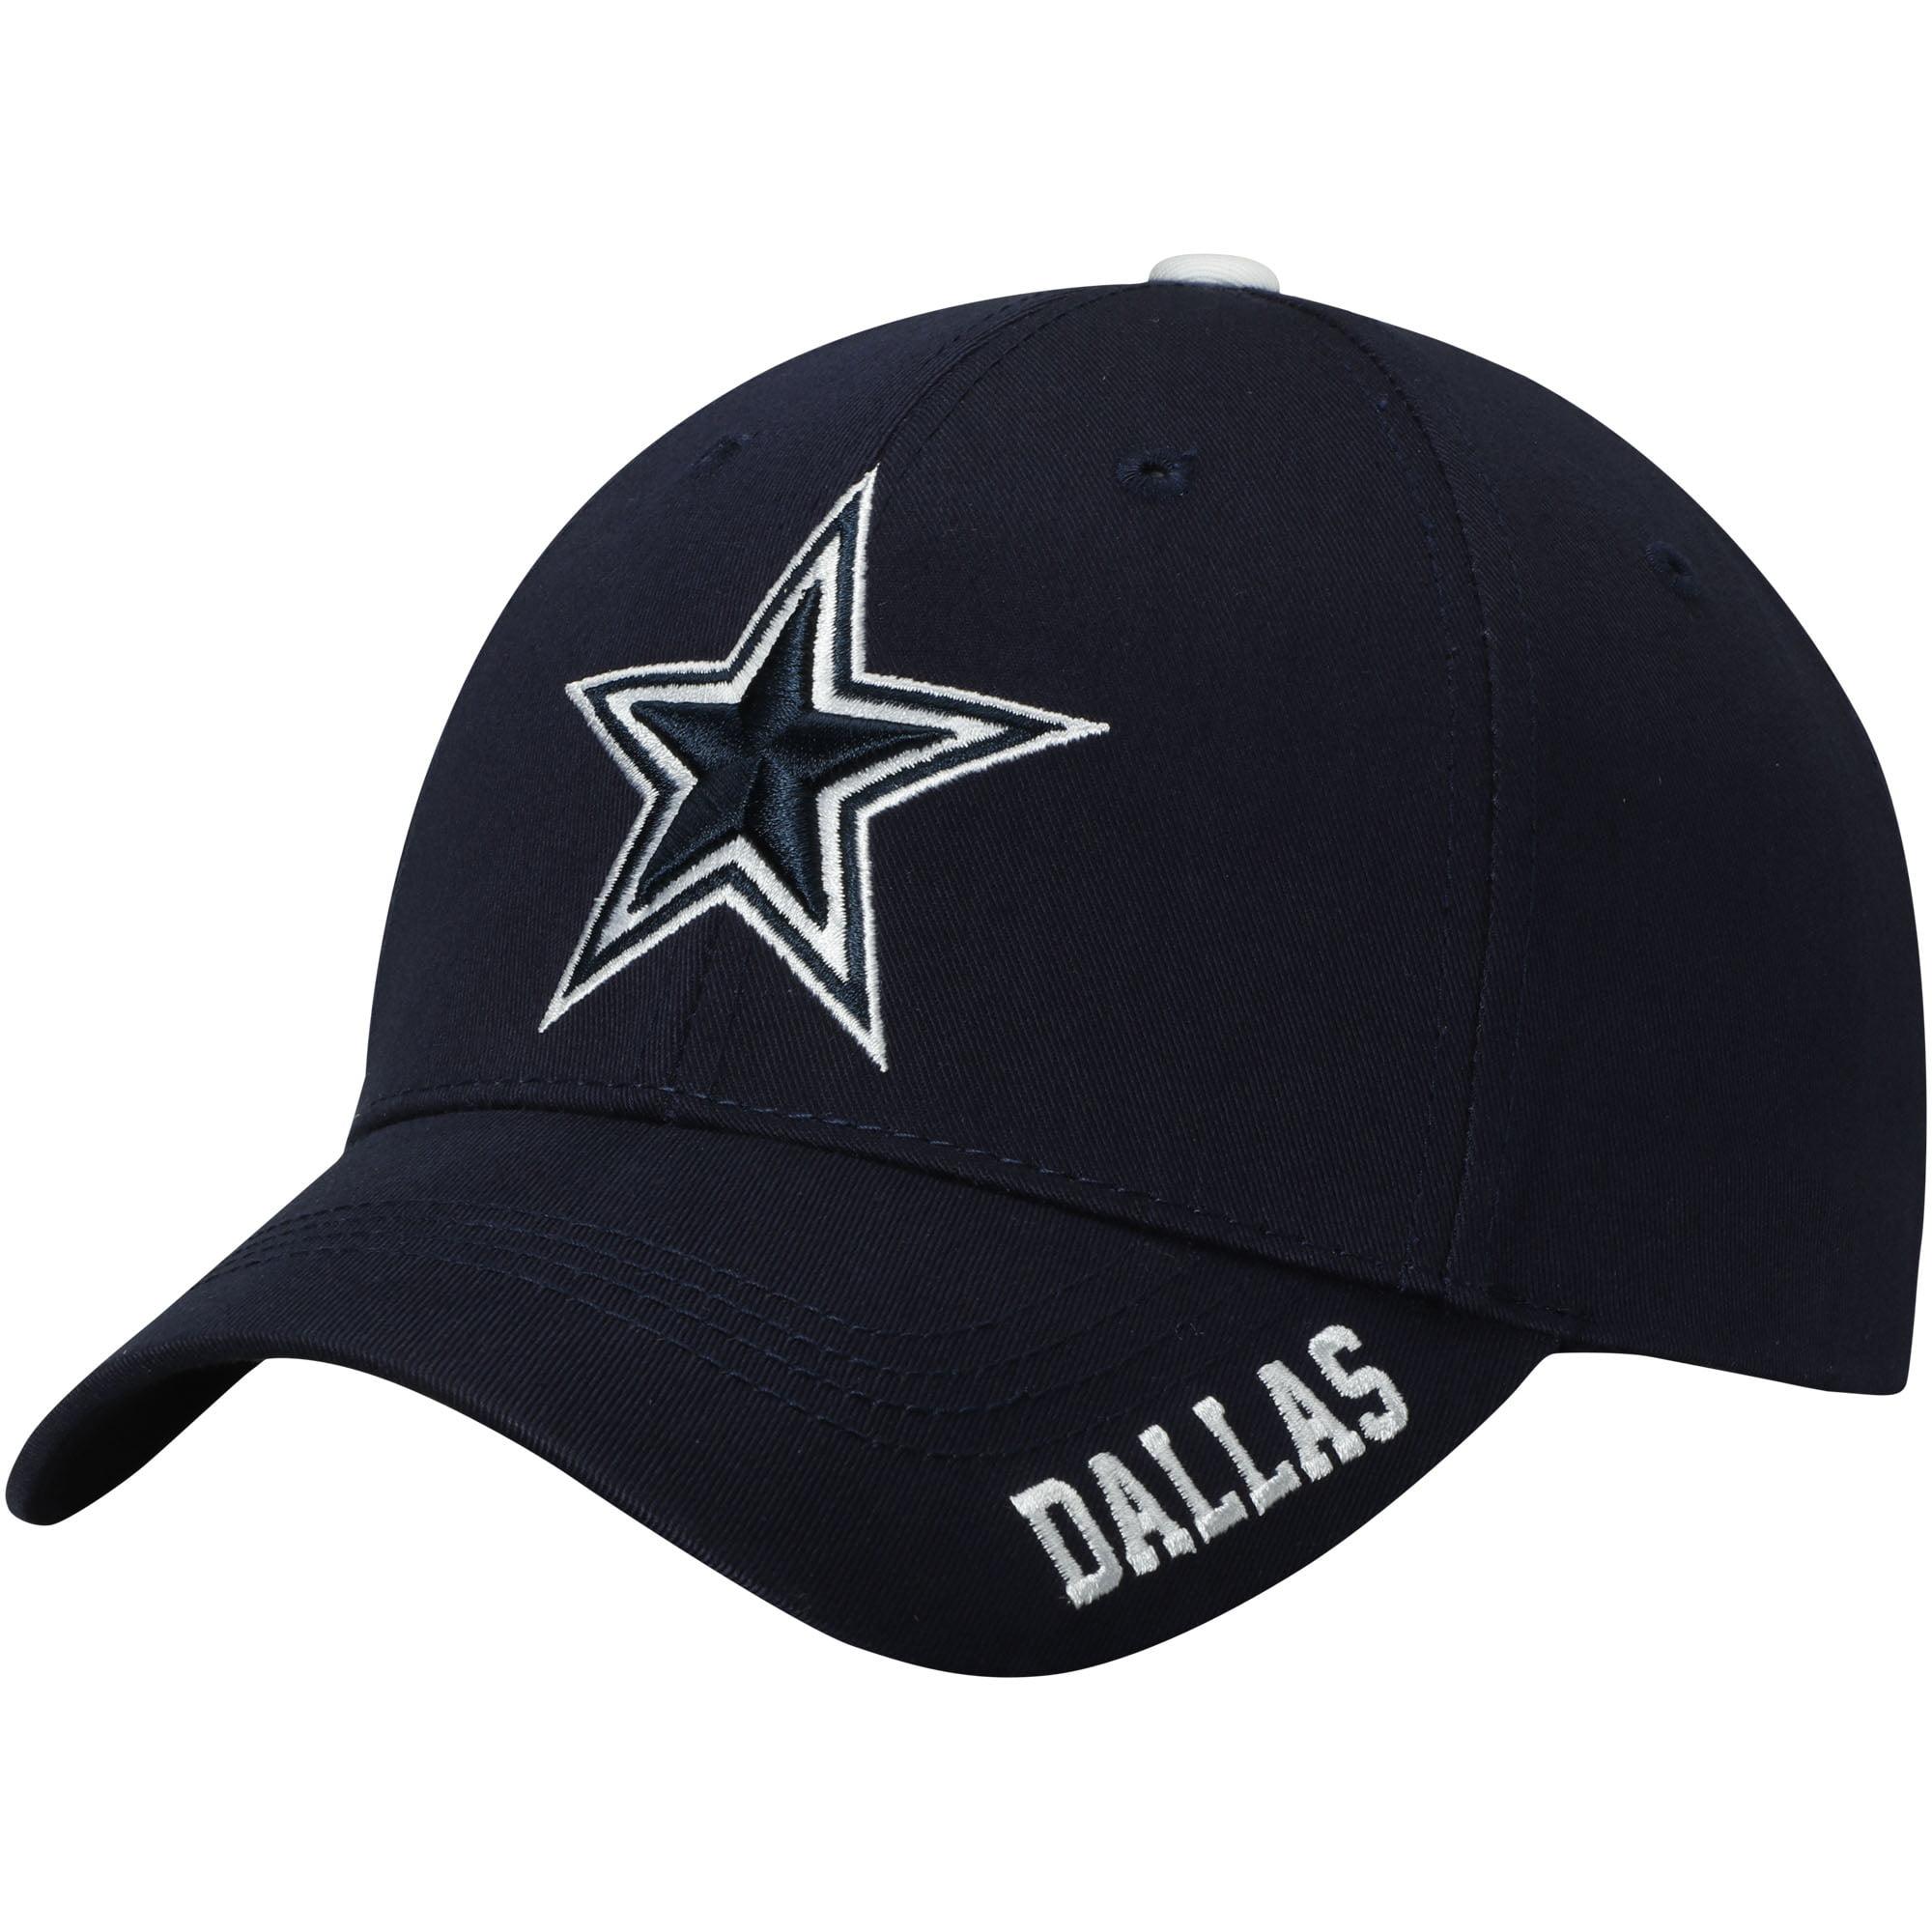 Dallas Cowboys Team Shop - Walmart.com 91457fe7e